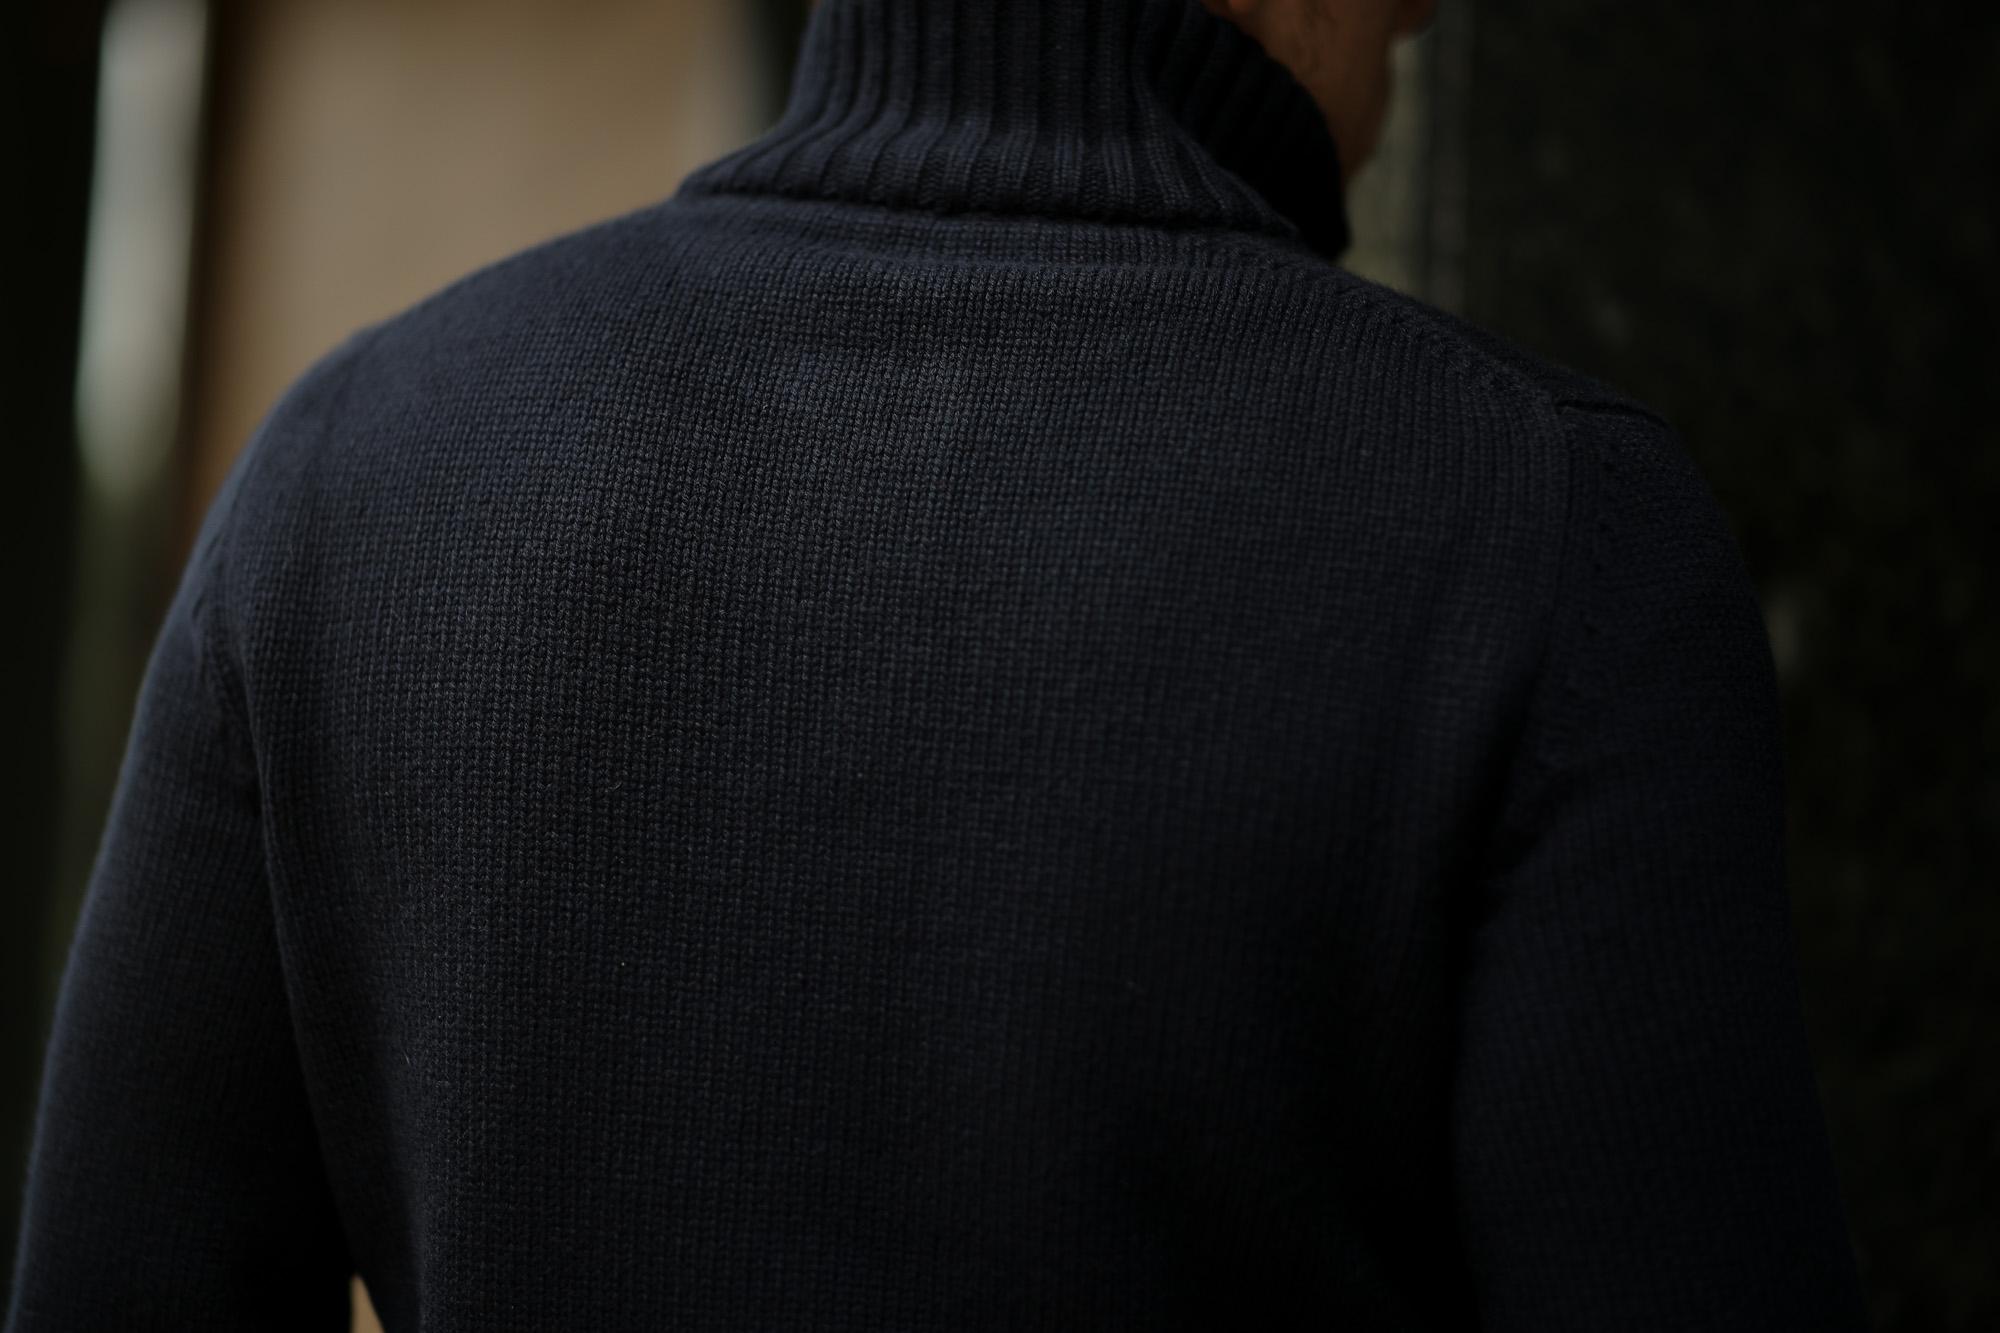 ZANONE (ザノーネ) CHIOTO Kyoto Cashmere (キョウト カシミア) ミドルゲージ カシミア ニット カーディガン ジャケット NAVY (ネイビー・Z1375) made in italy (イタリア製) 2018 秋冬新作 愛知 名古屋 alto e diritto アルトエデリットカシミヤ